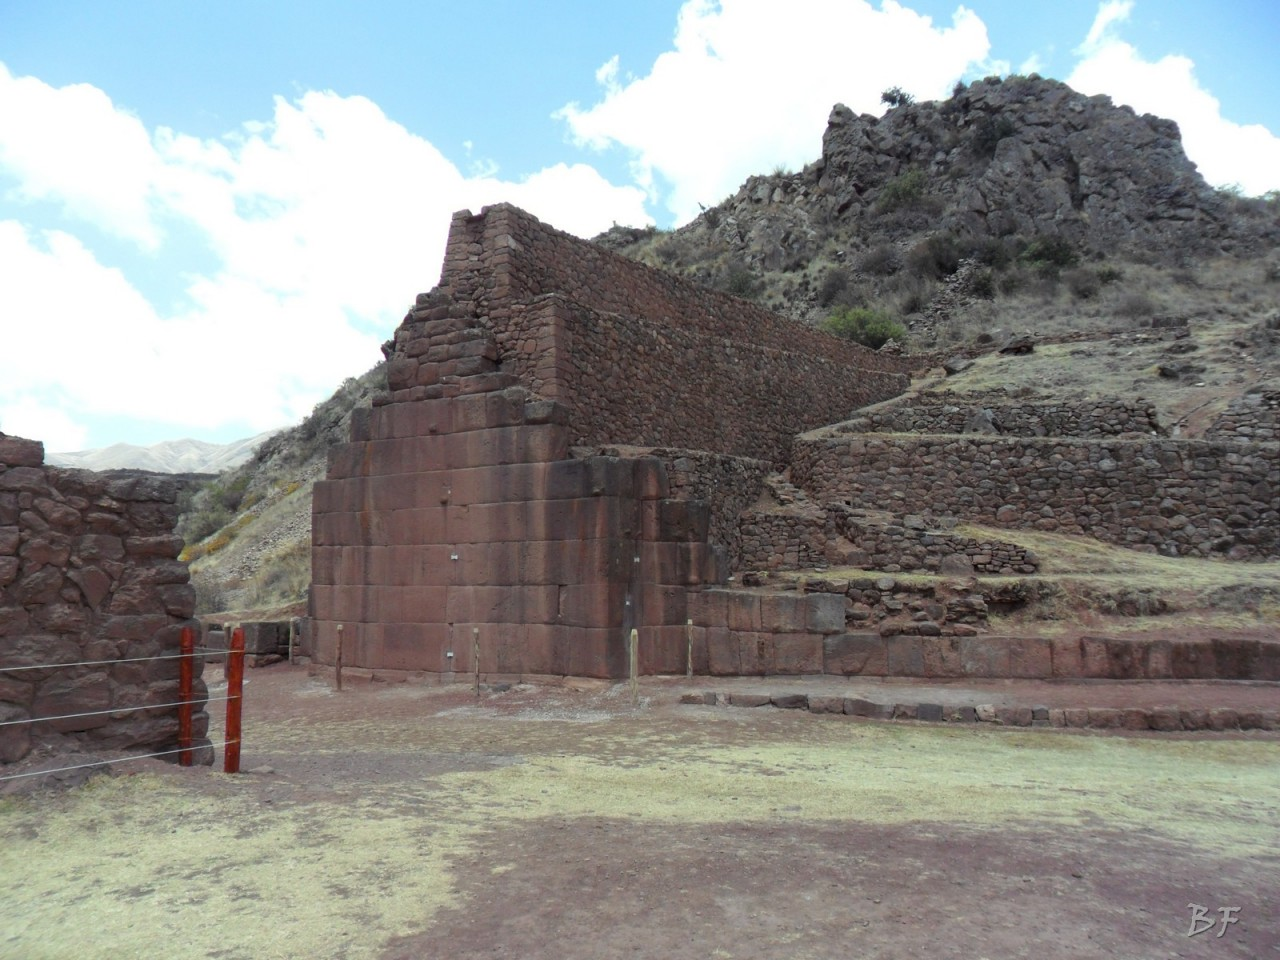 Parco-Archeologico-Megaliti-Rumicolca-Cusco-Perù-6